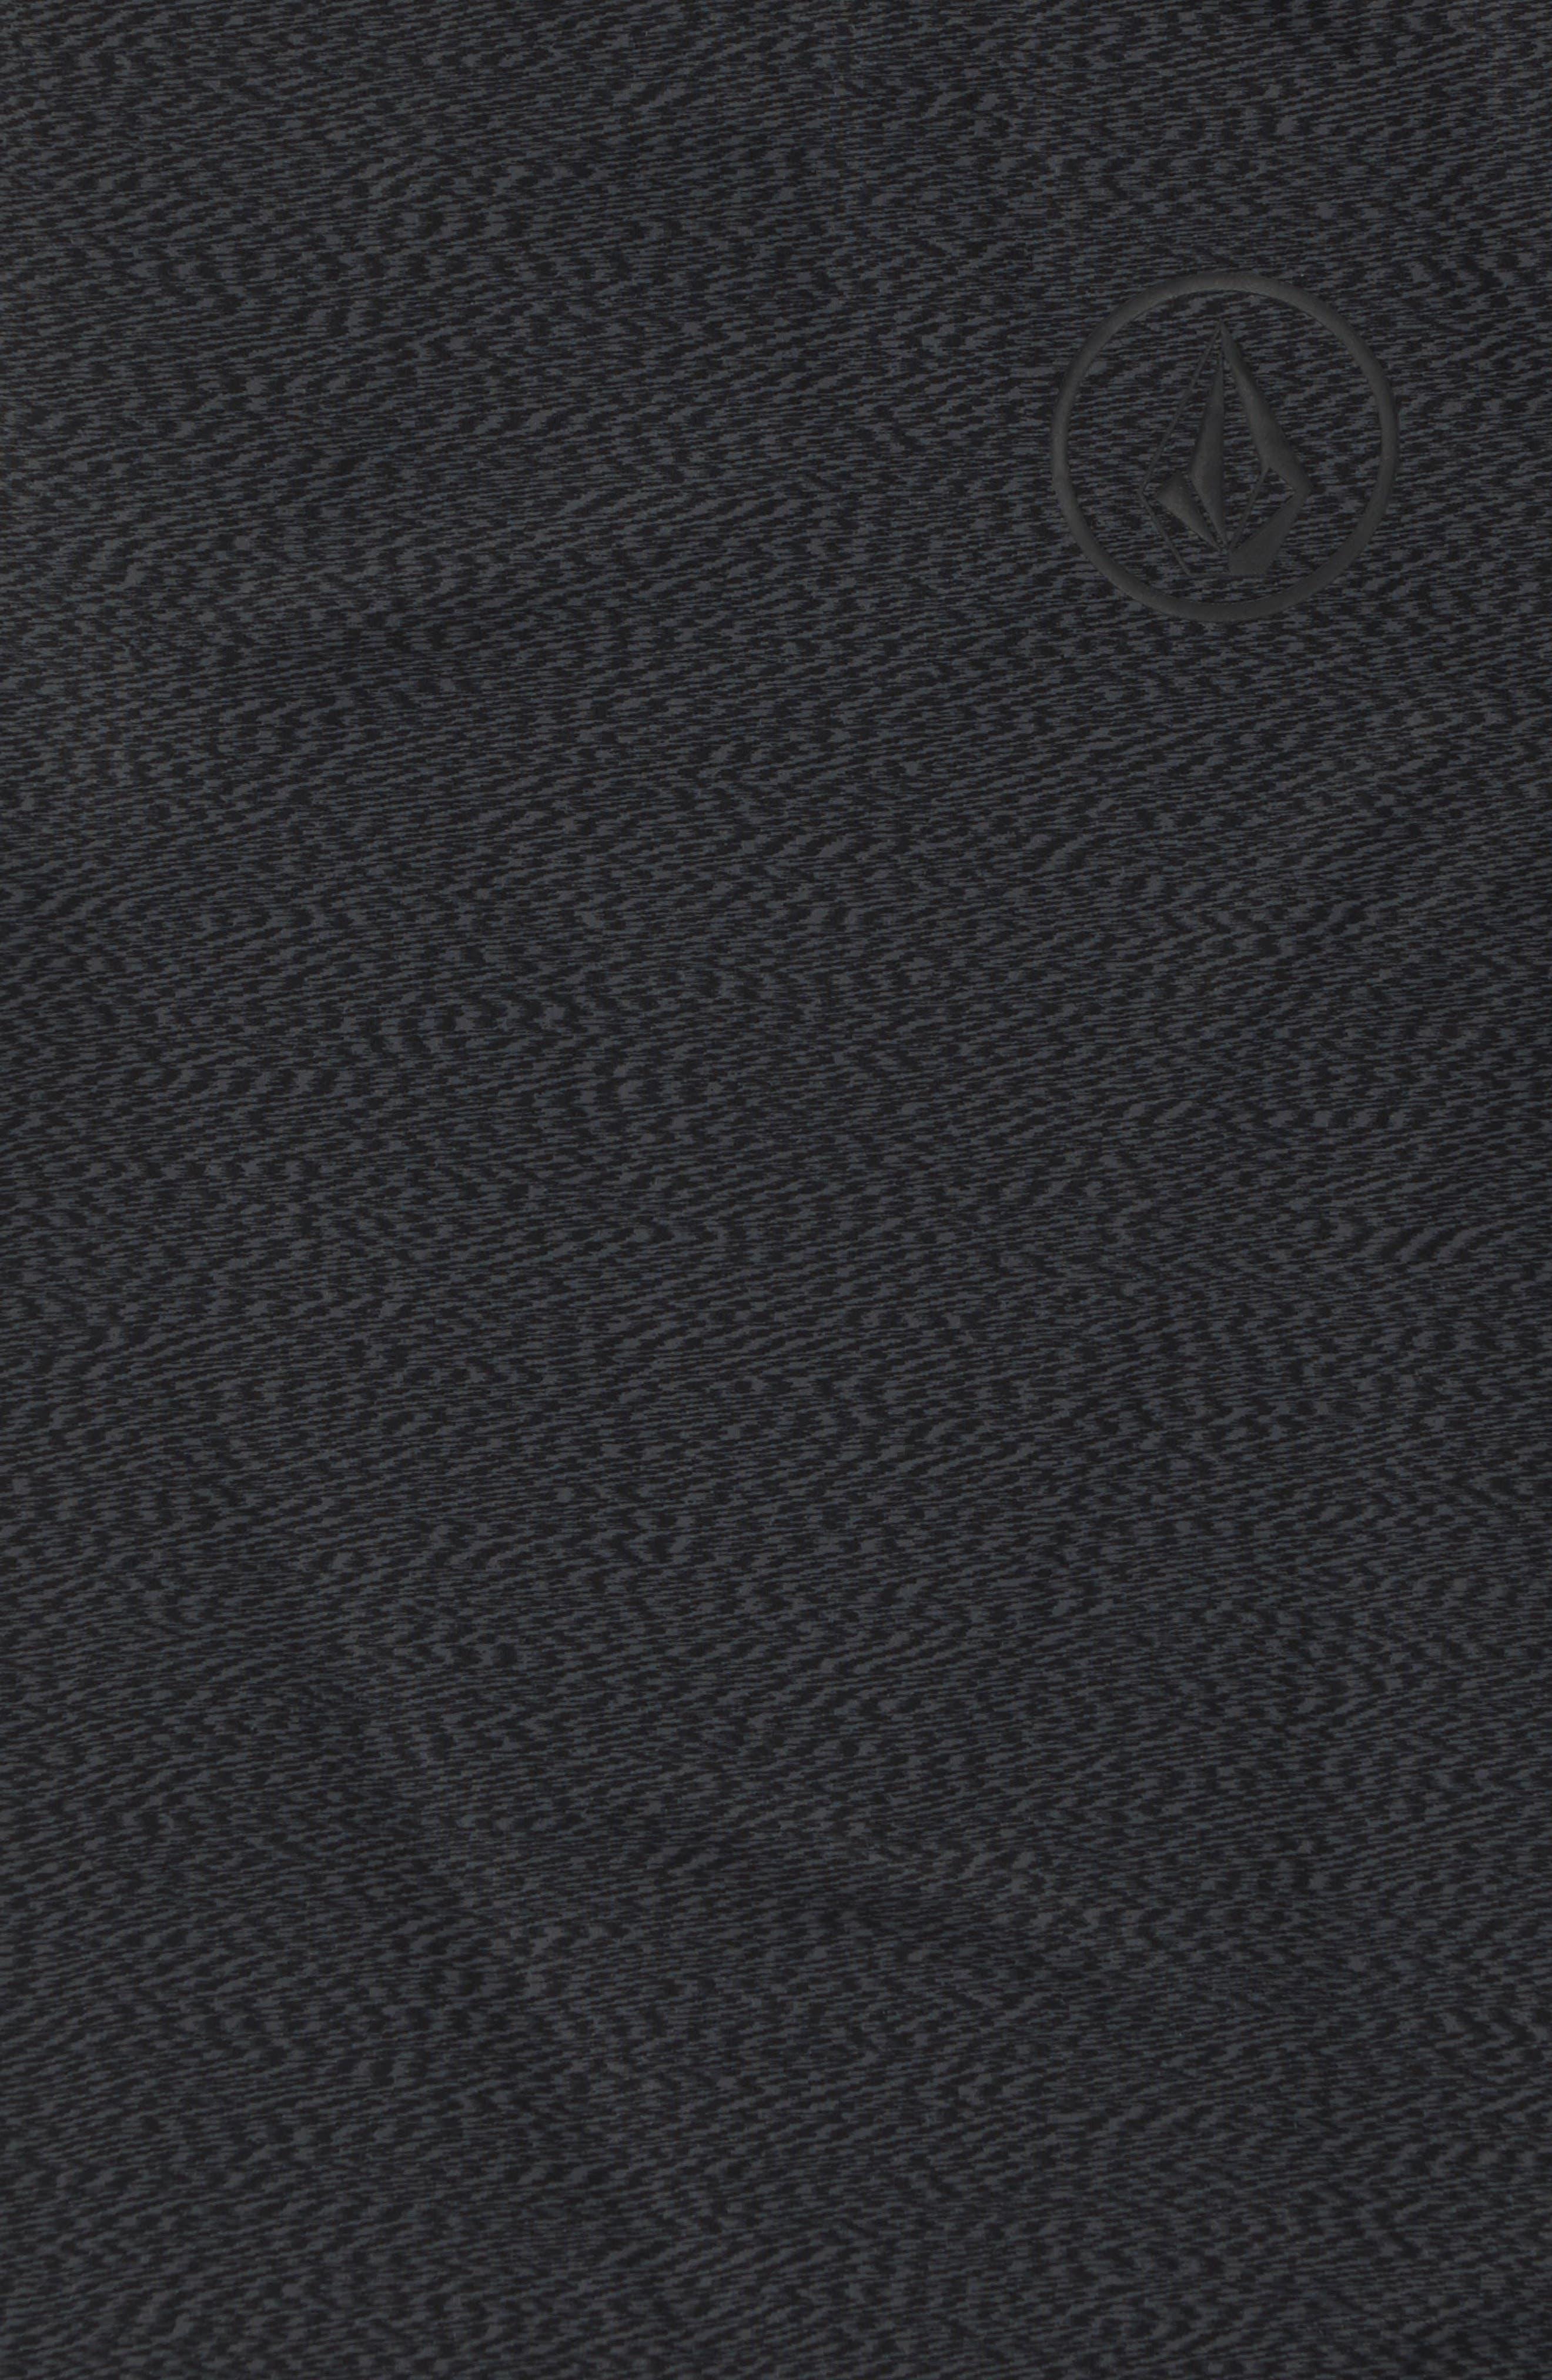 Thrashguard Distortion Rashguard,                         Main,                         color, 021